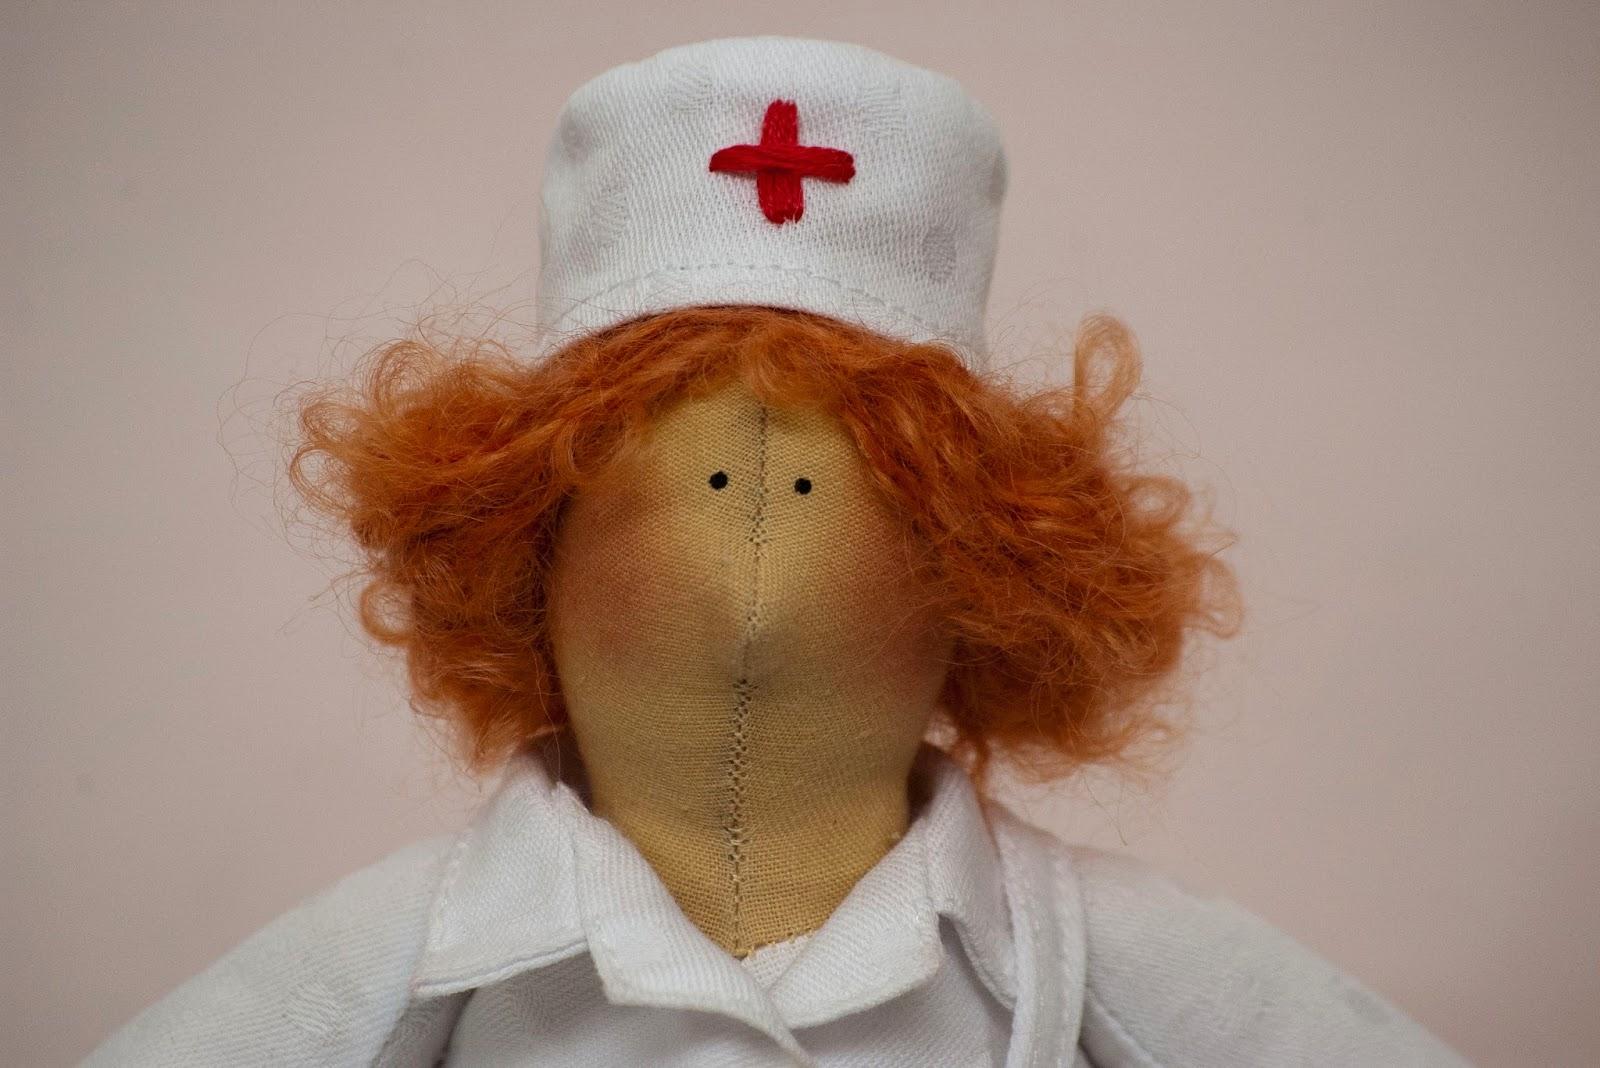 Фото старых медсестер 17 фотография